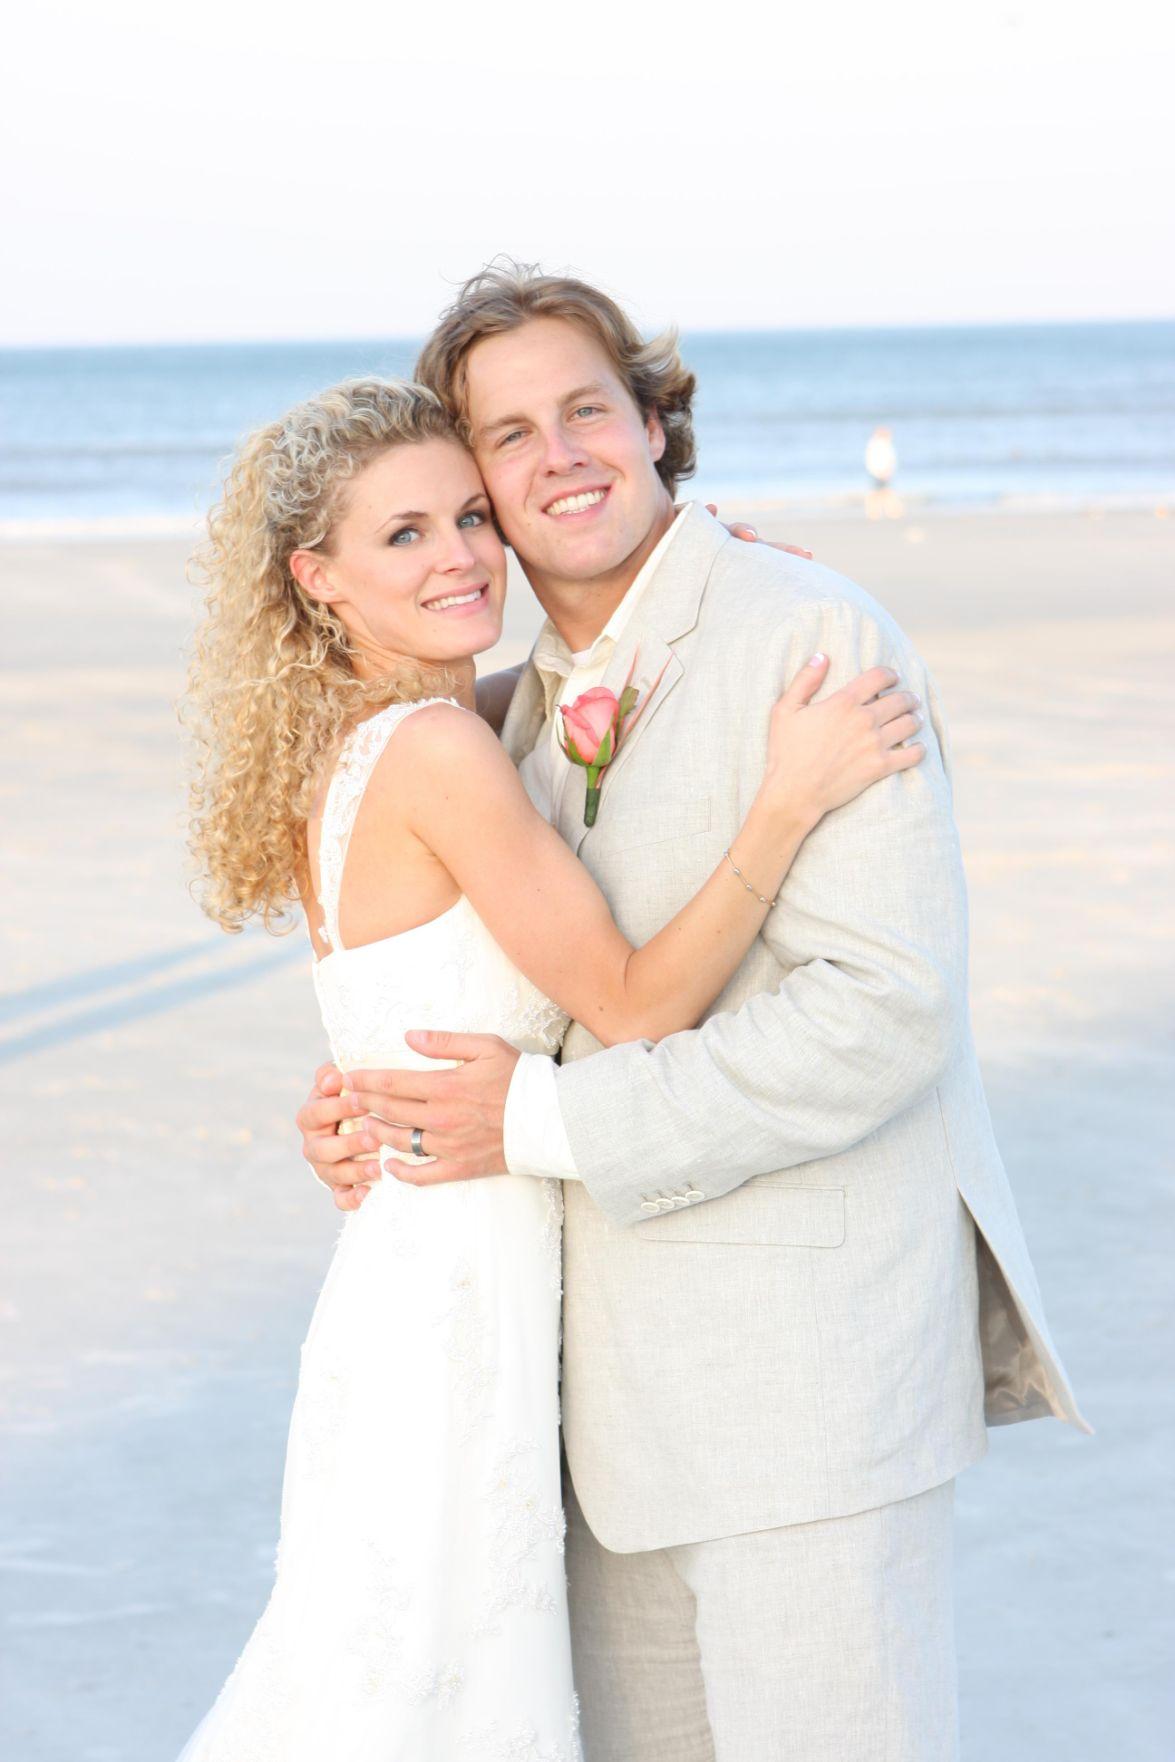 Swank wedding photo